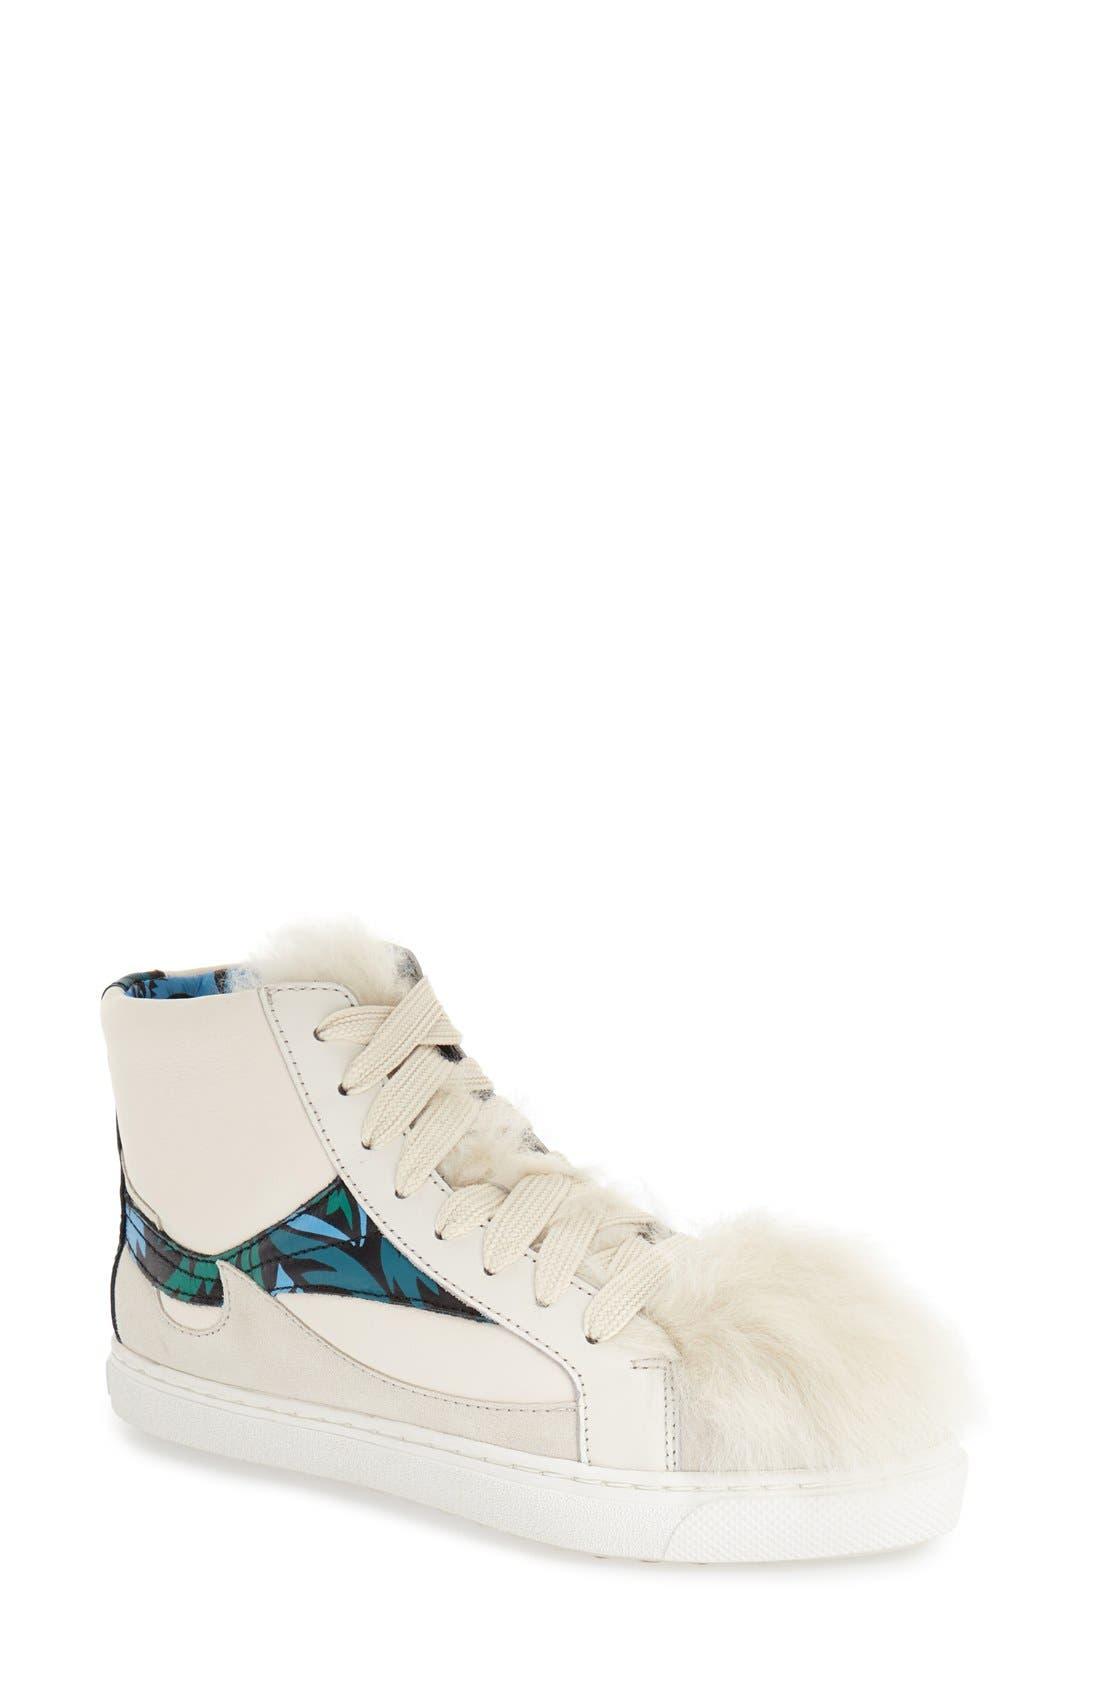 COACH Genuine Shearling High Top Sneaker, Main, color, 188